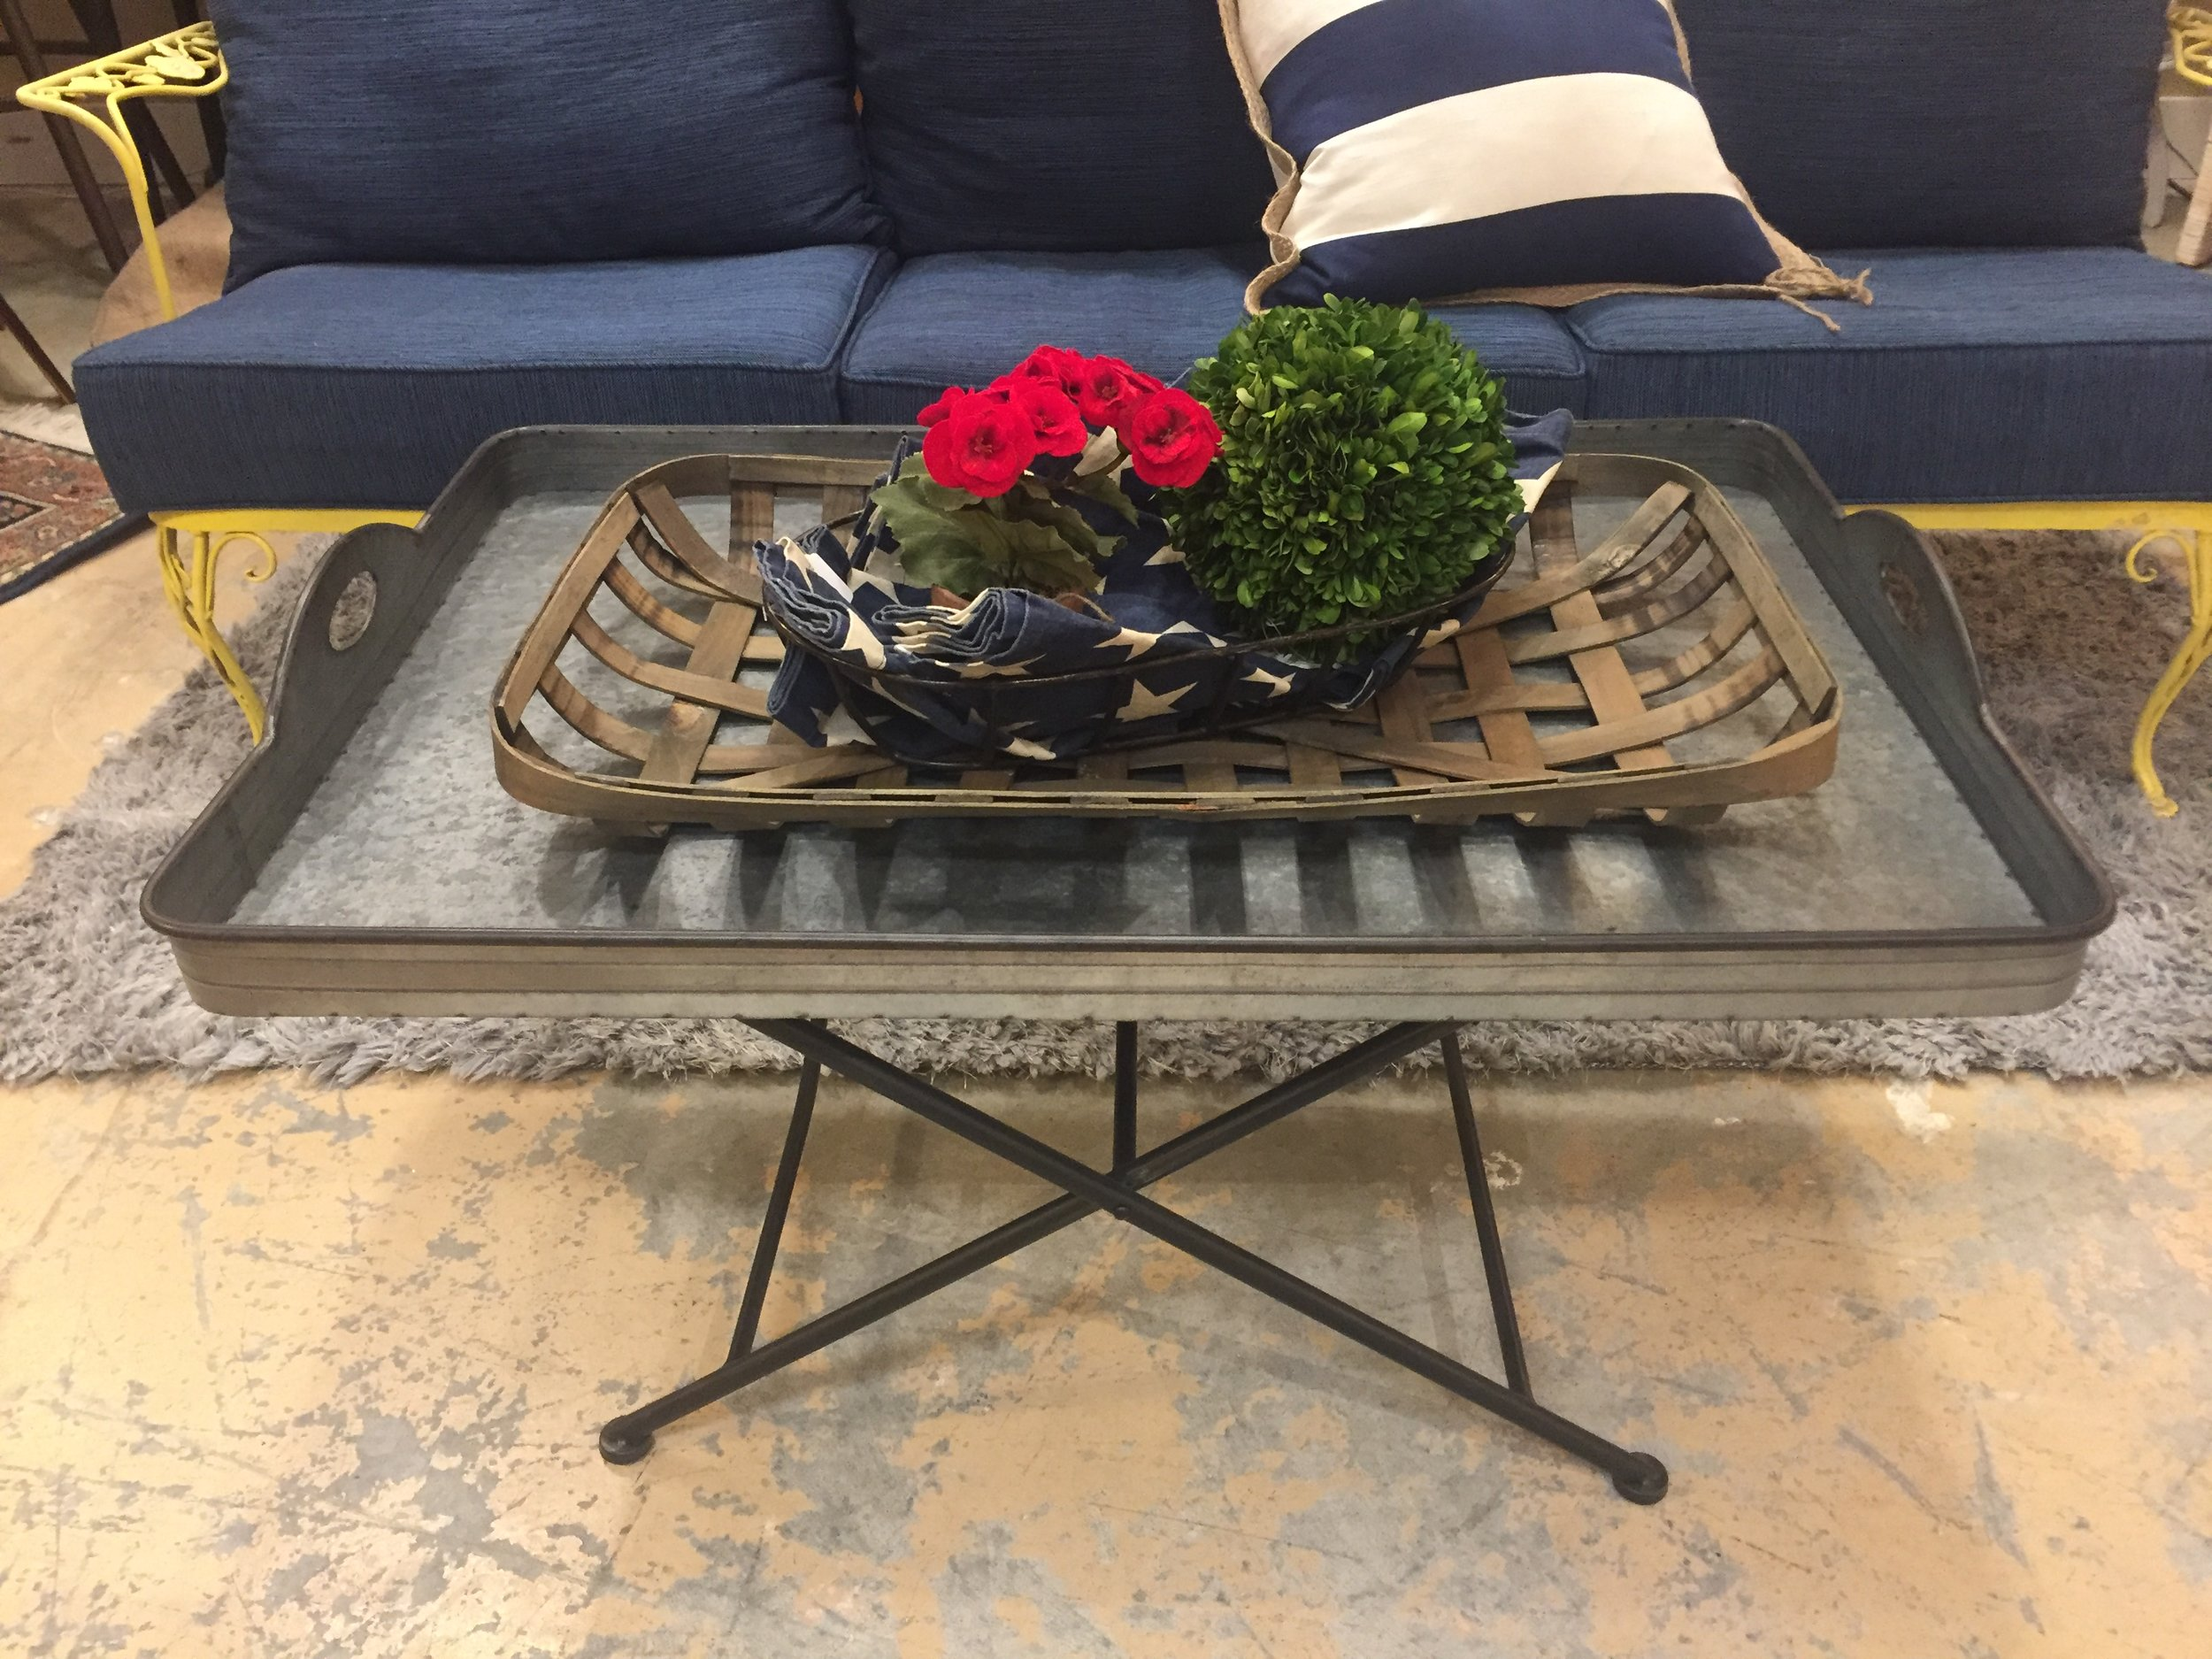 Botanist Tray Table $199.95 - 001 22073